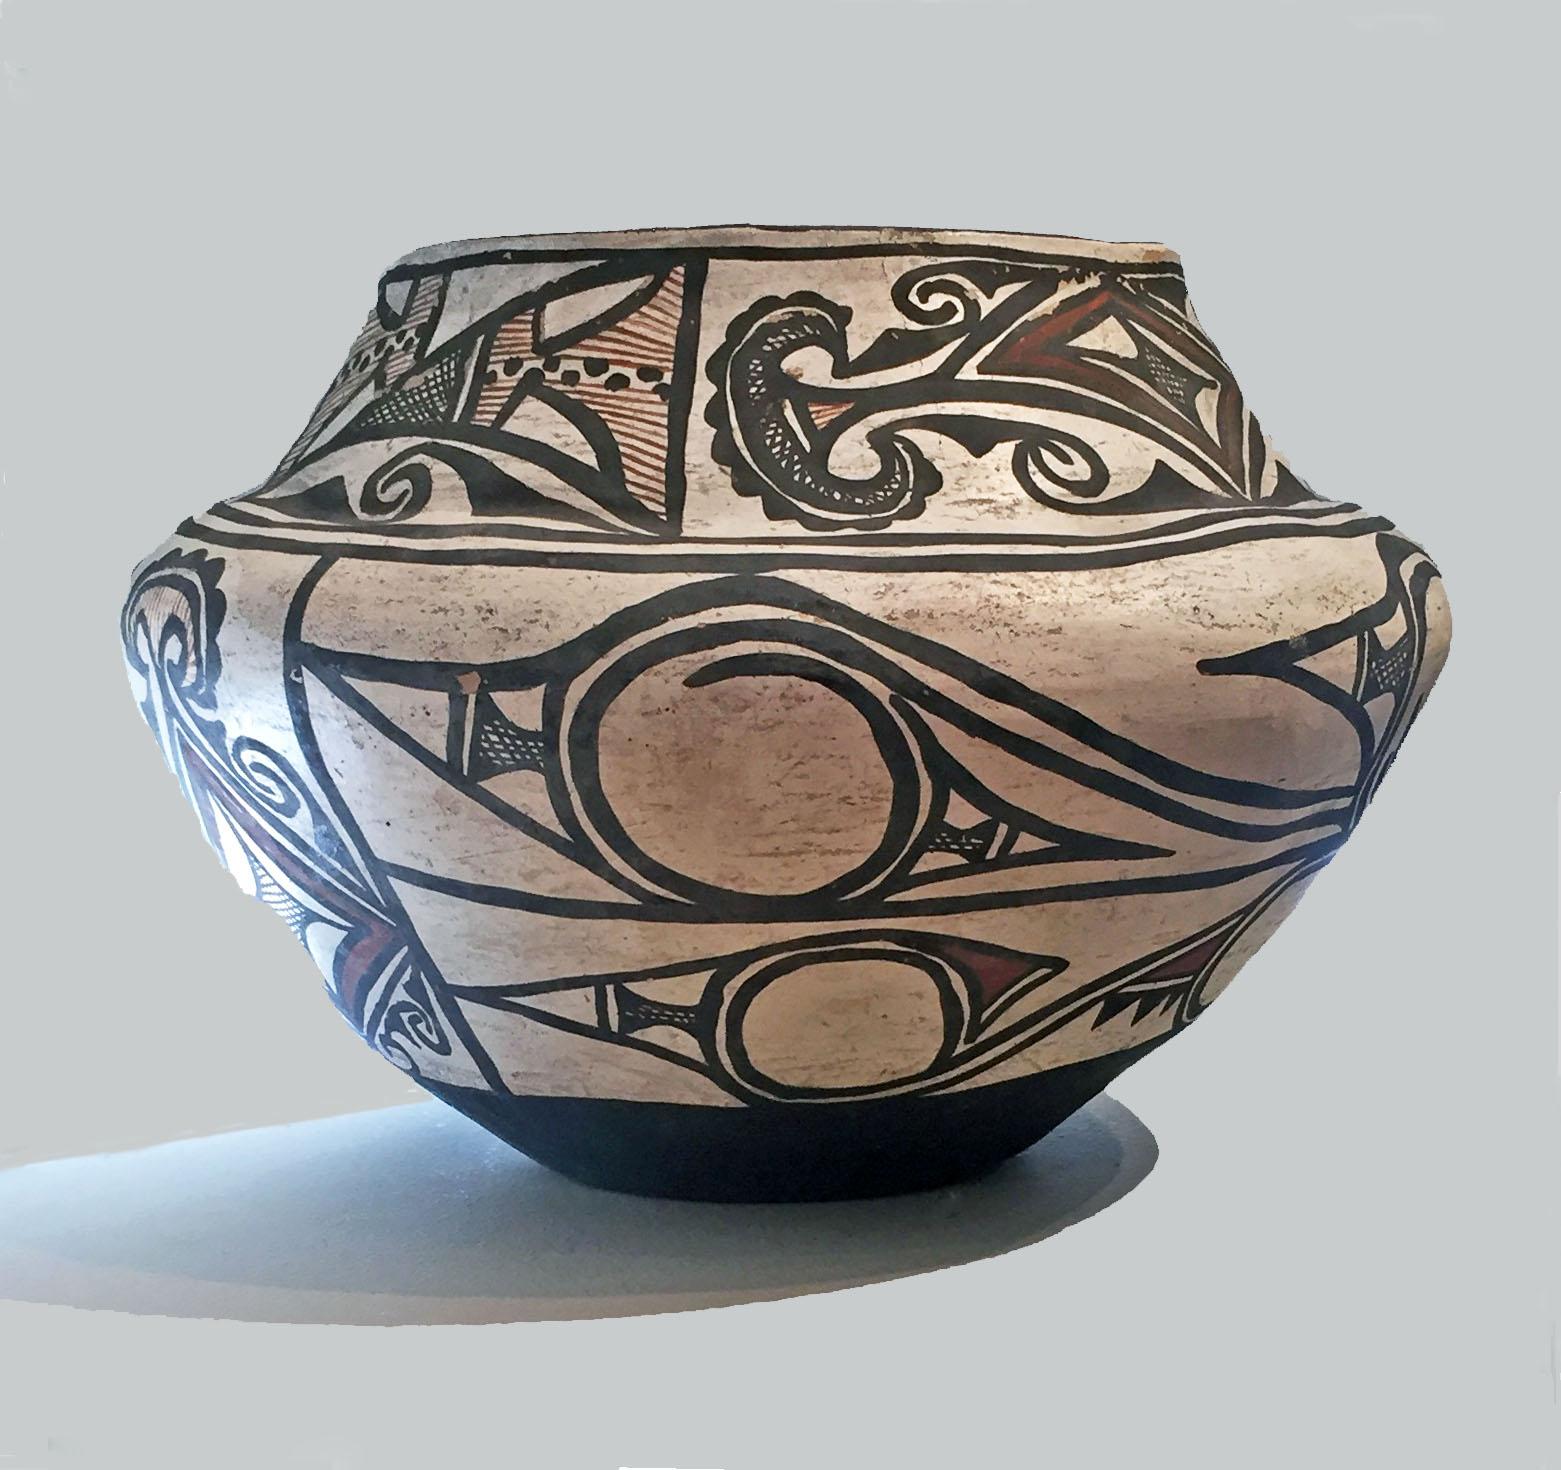 "Zuni polychrome jar, circa 1875. 12"" diameter x 9"" high.   http://www.marcyburns.com/pottery-collection/x6xk1v5rupecrb5d9kw09mziptjoea"